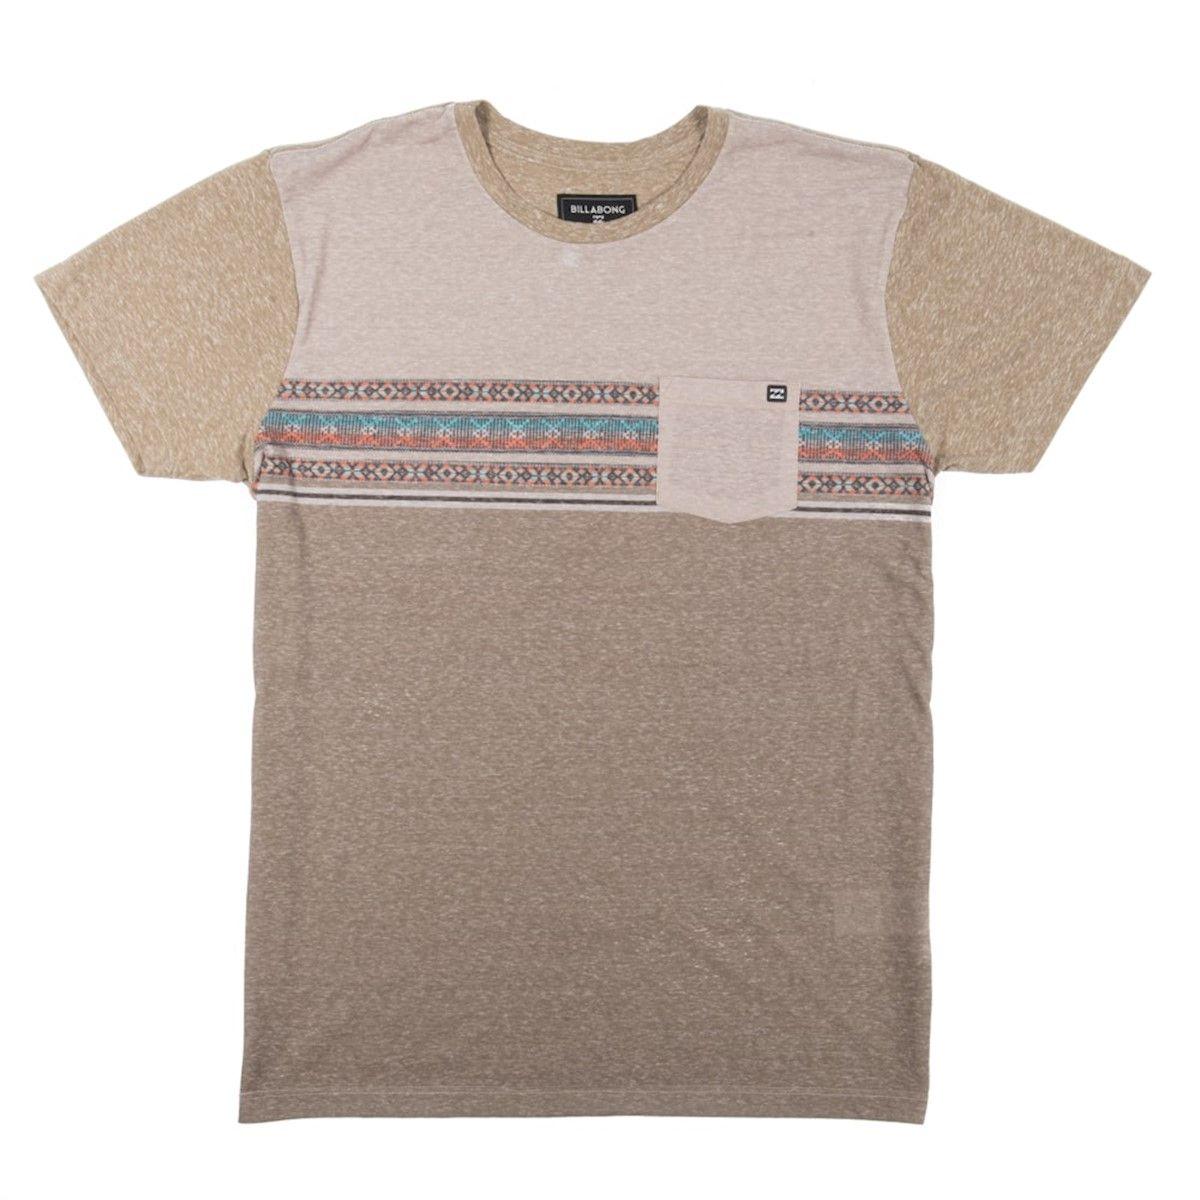 Camiseta Billabong Team Stripe I